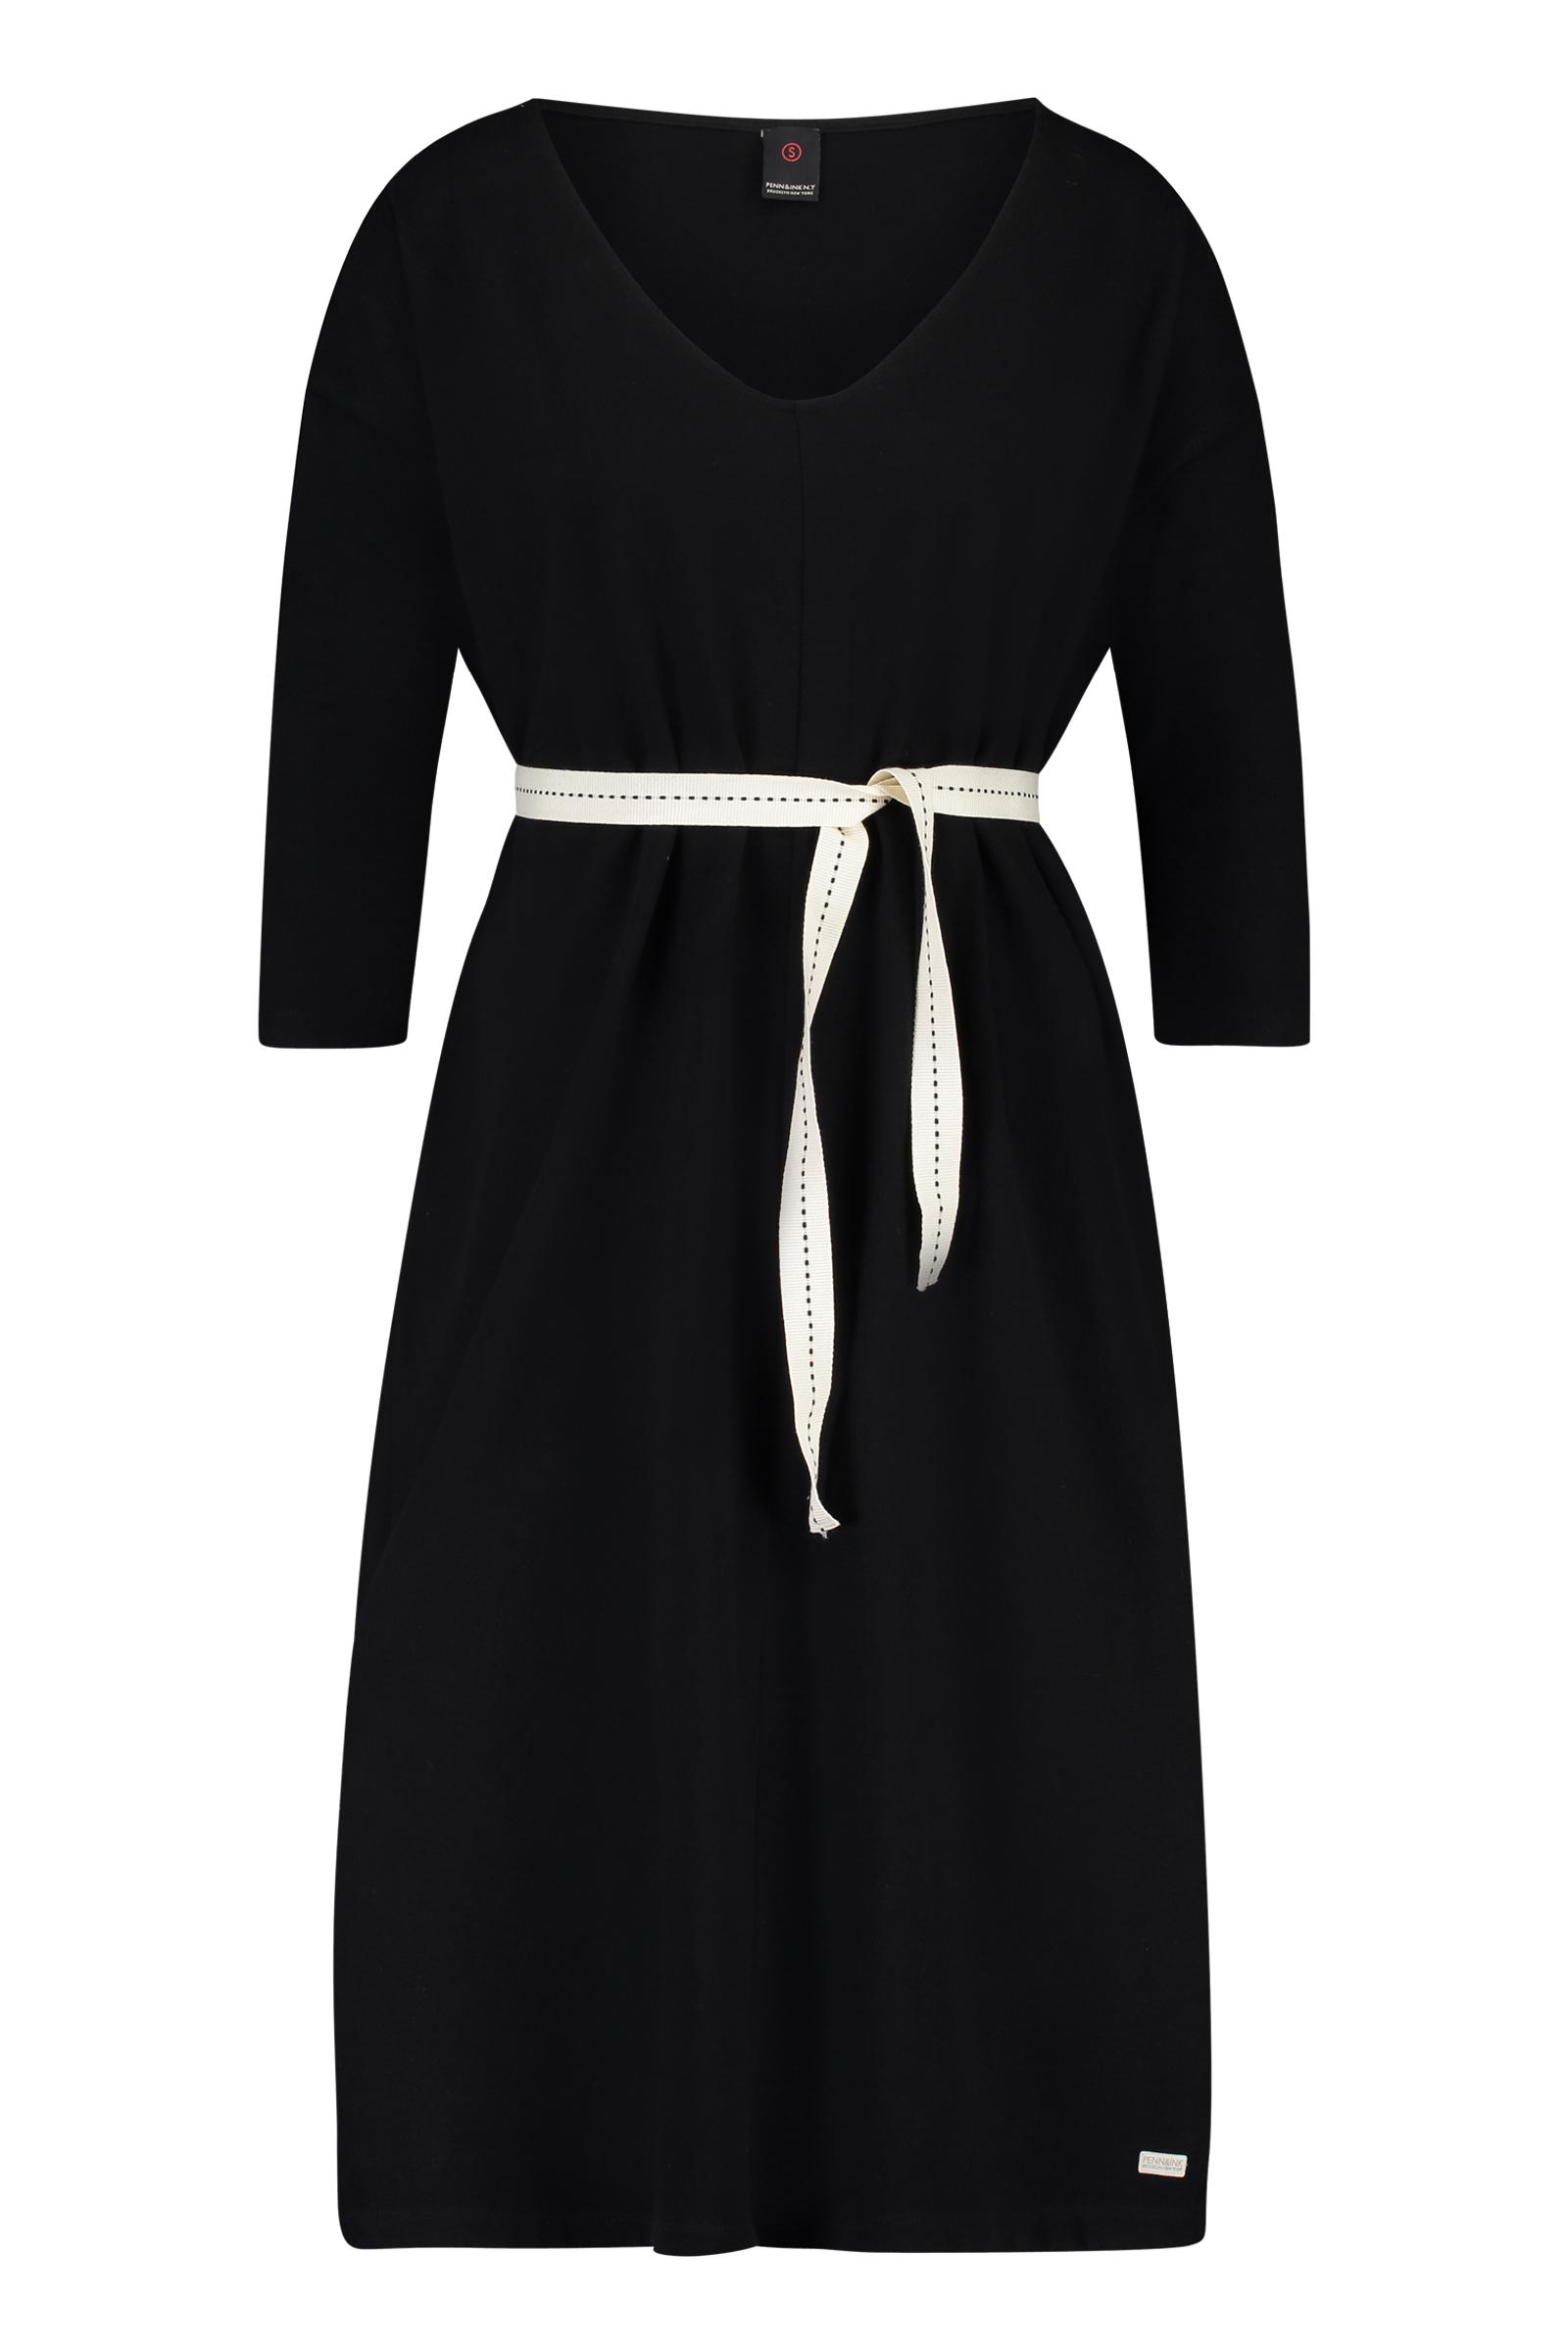 Zwart dames jurk met wit letter detail Penn & Ink - S18F170